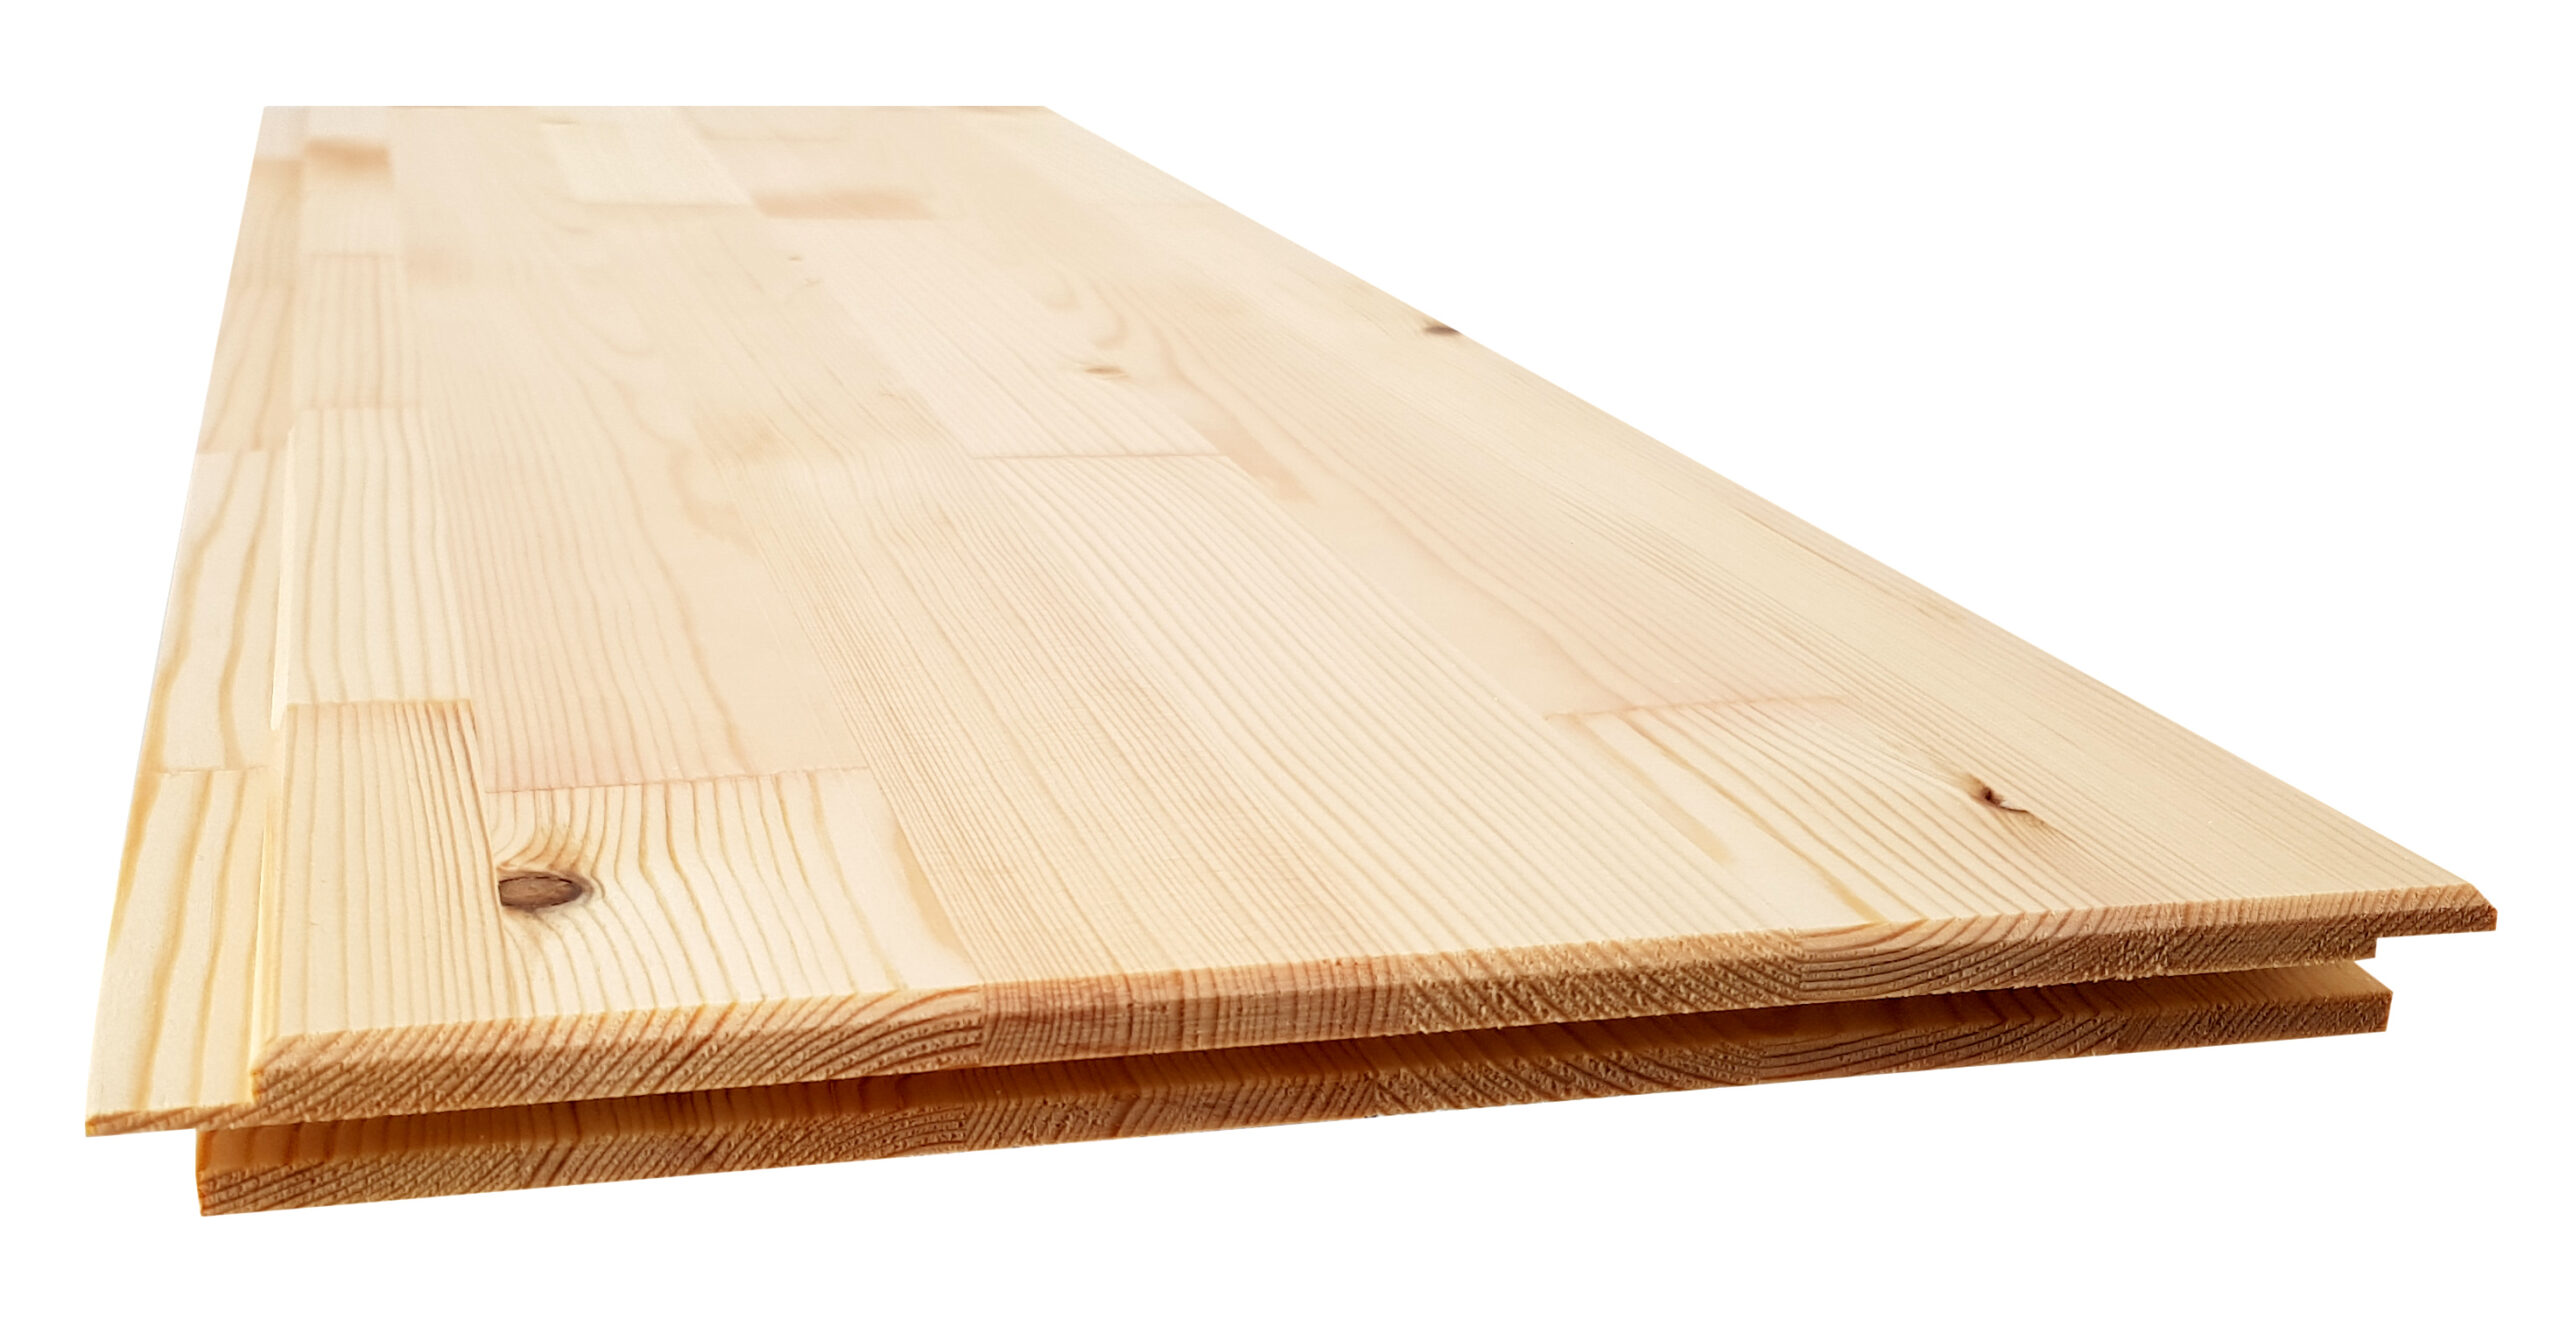 NORTO Friis træpanel (ubehandlet)